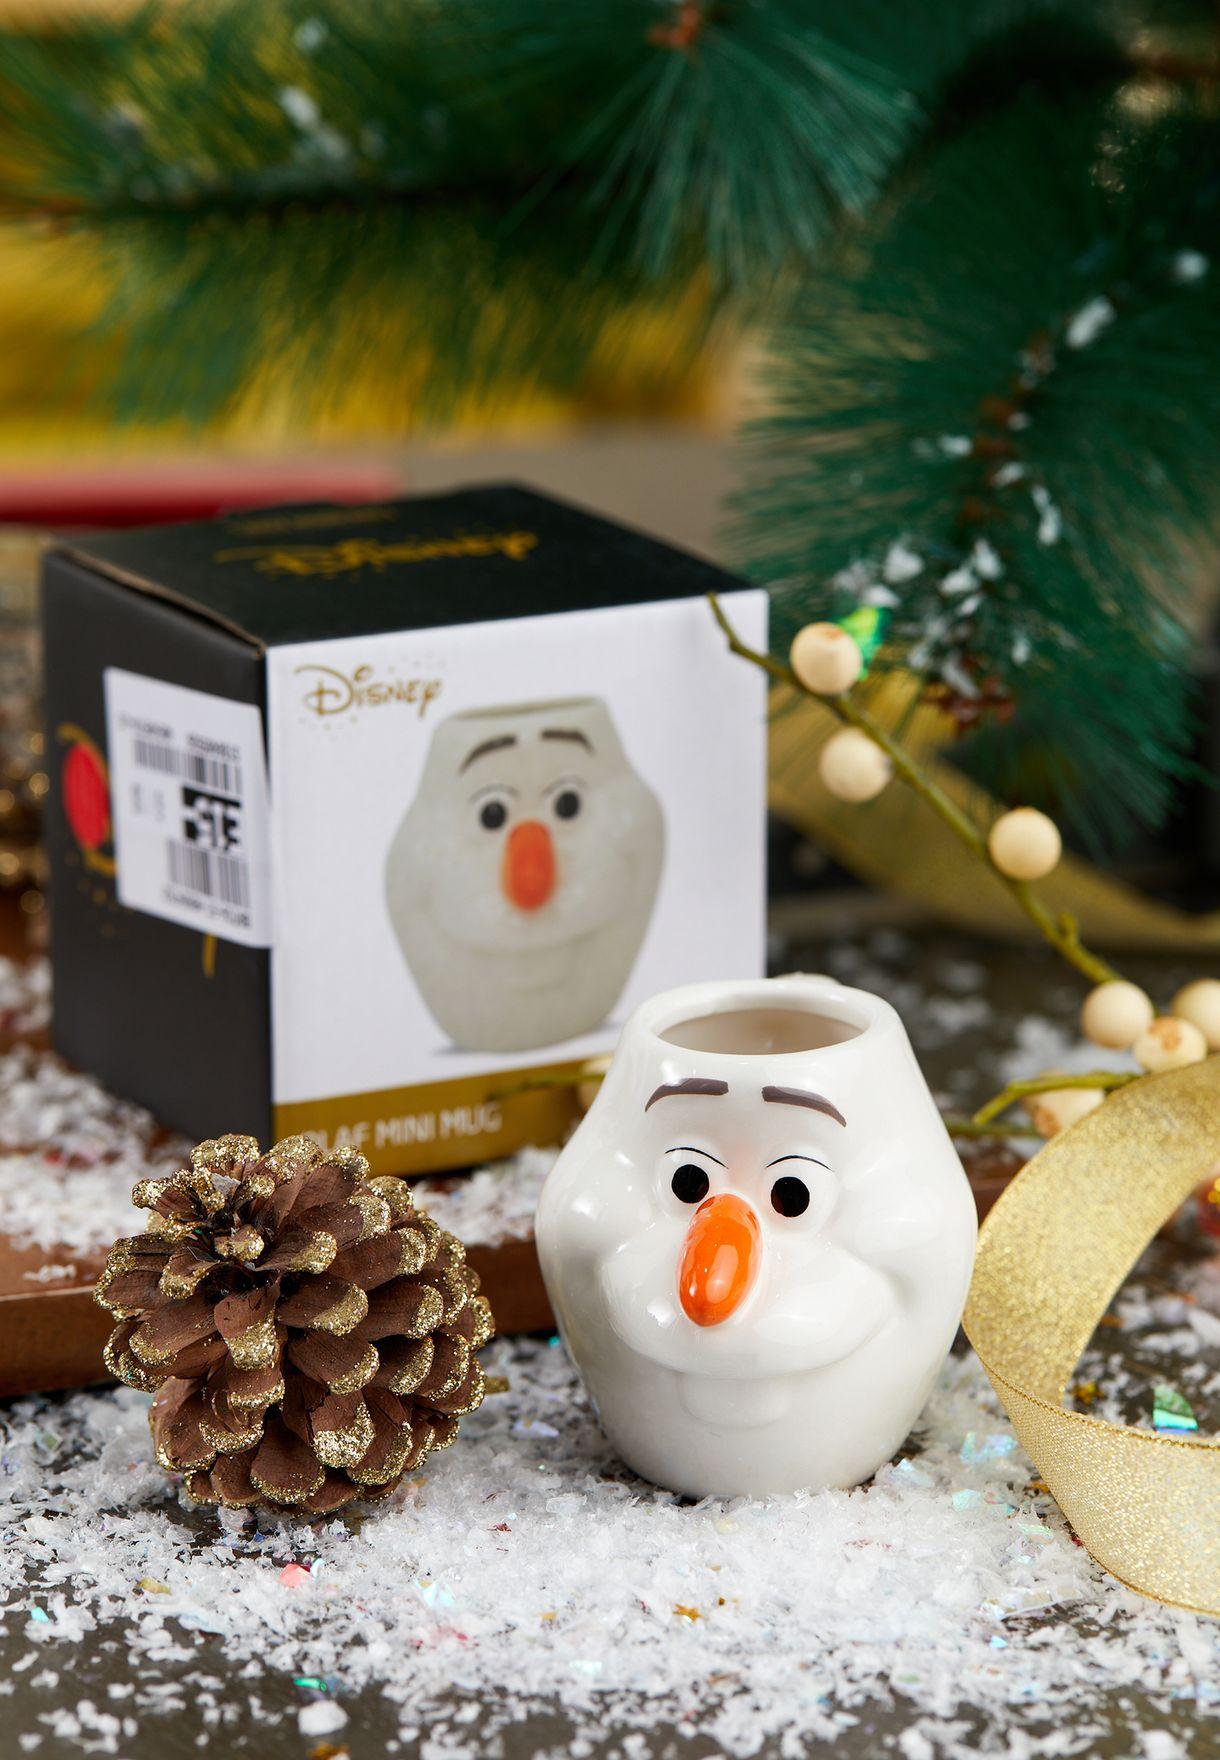 Frozen Olaf Mini Mug